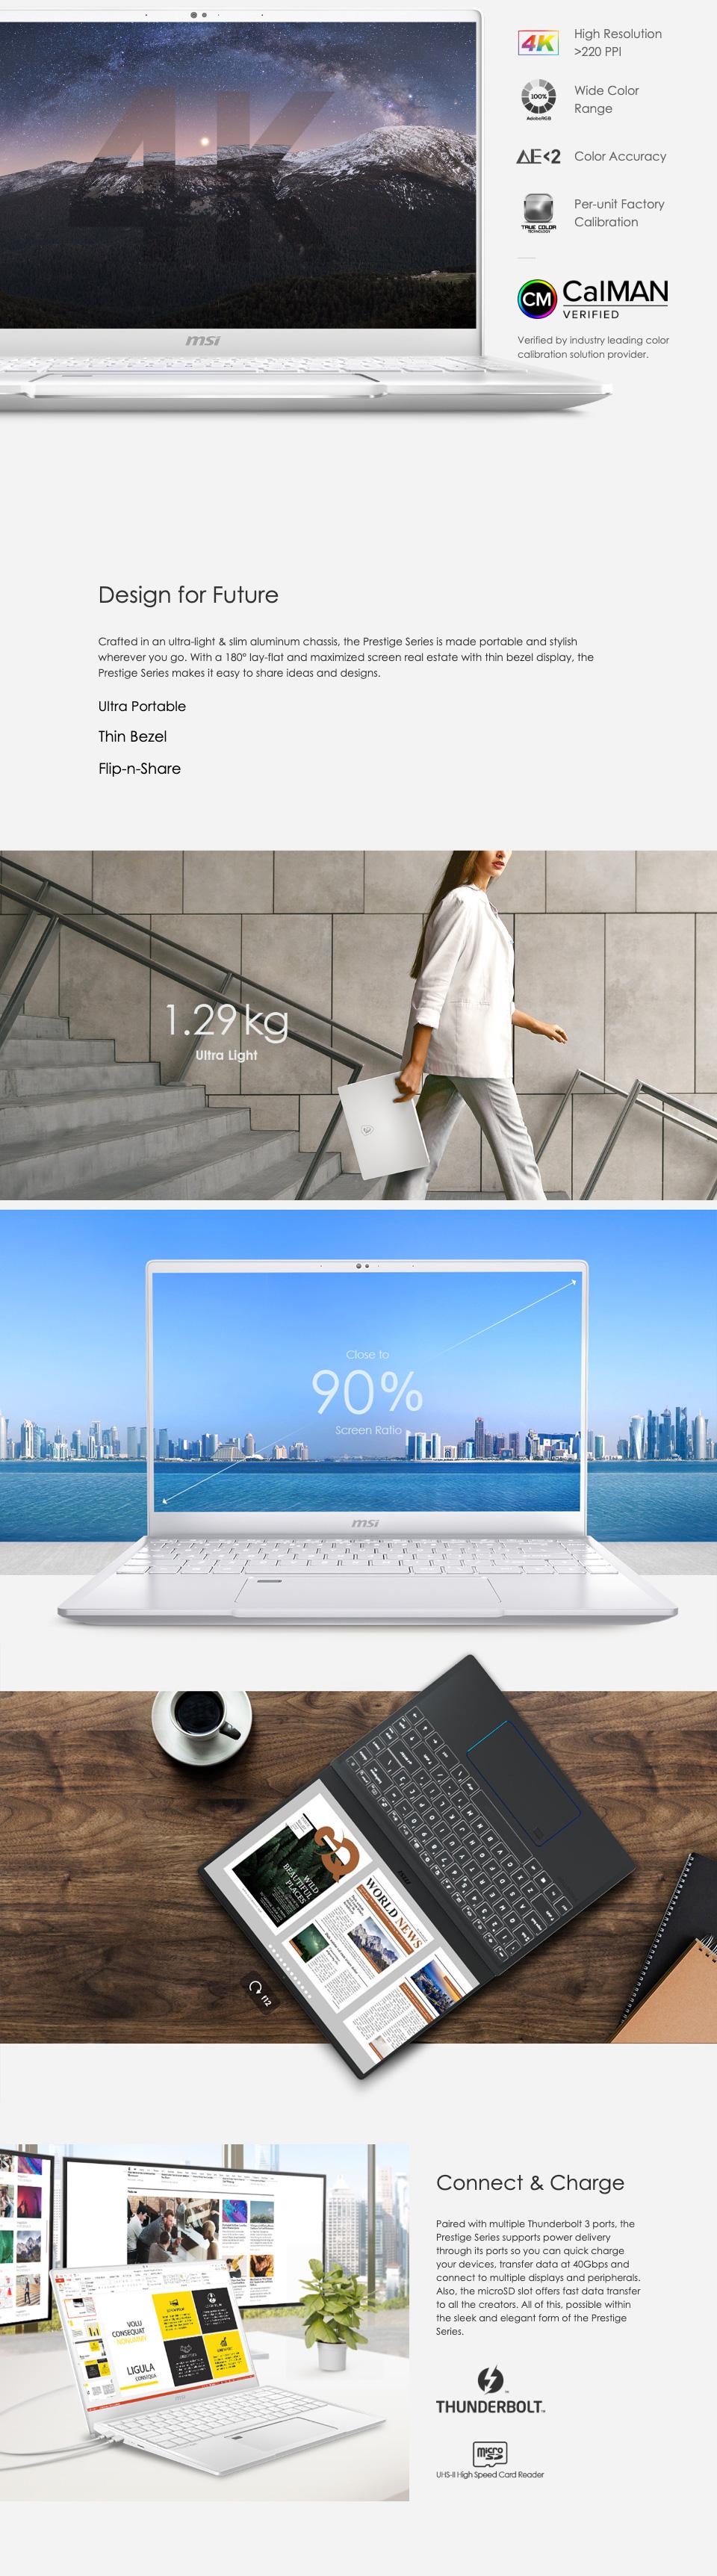 MSI Prestige 15 GTX1650 14in UHD 100% ADOBE RGB Notebook features 3